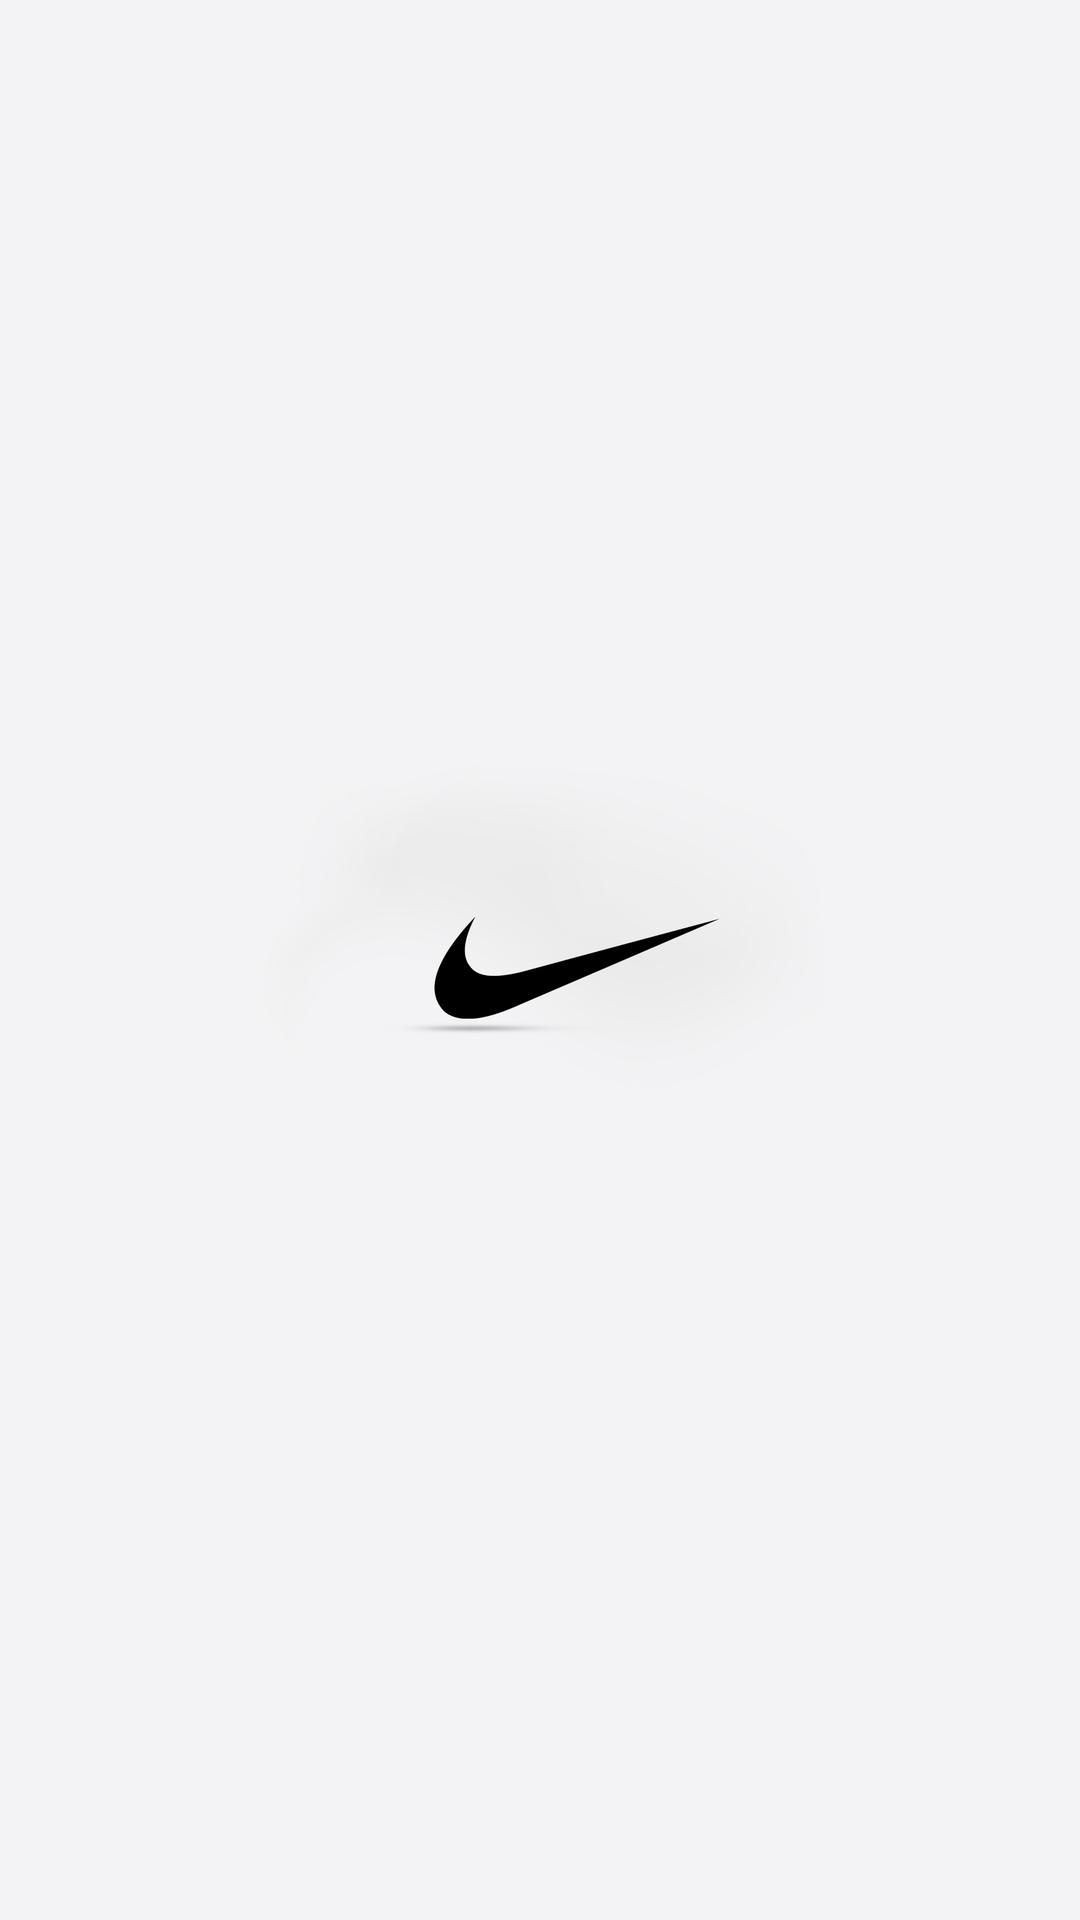 Nike htc one wallpaper